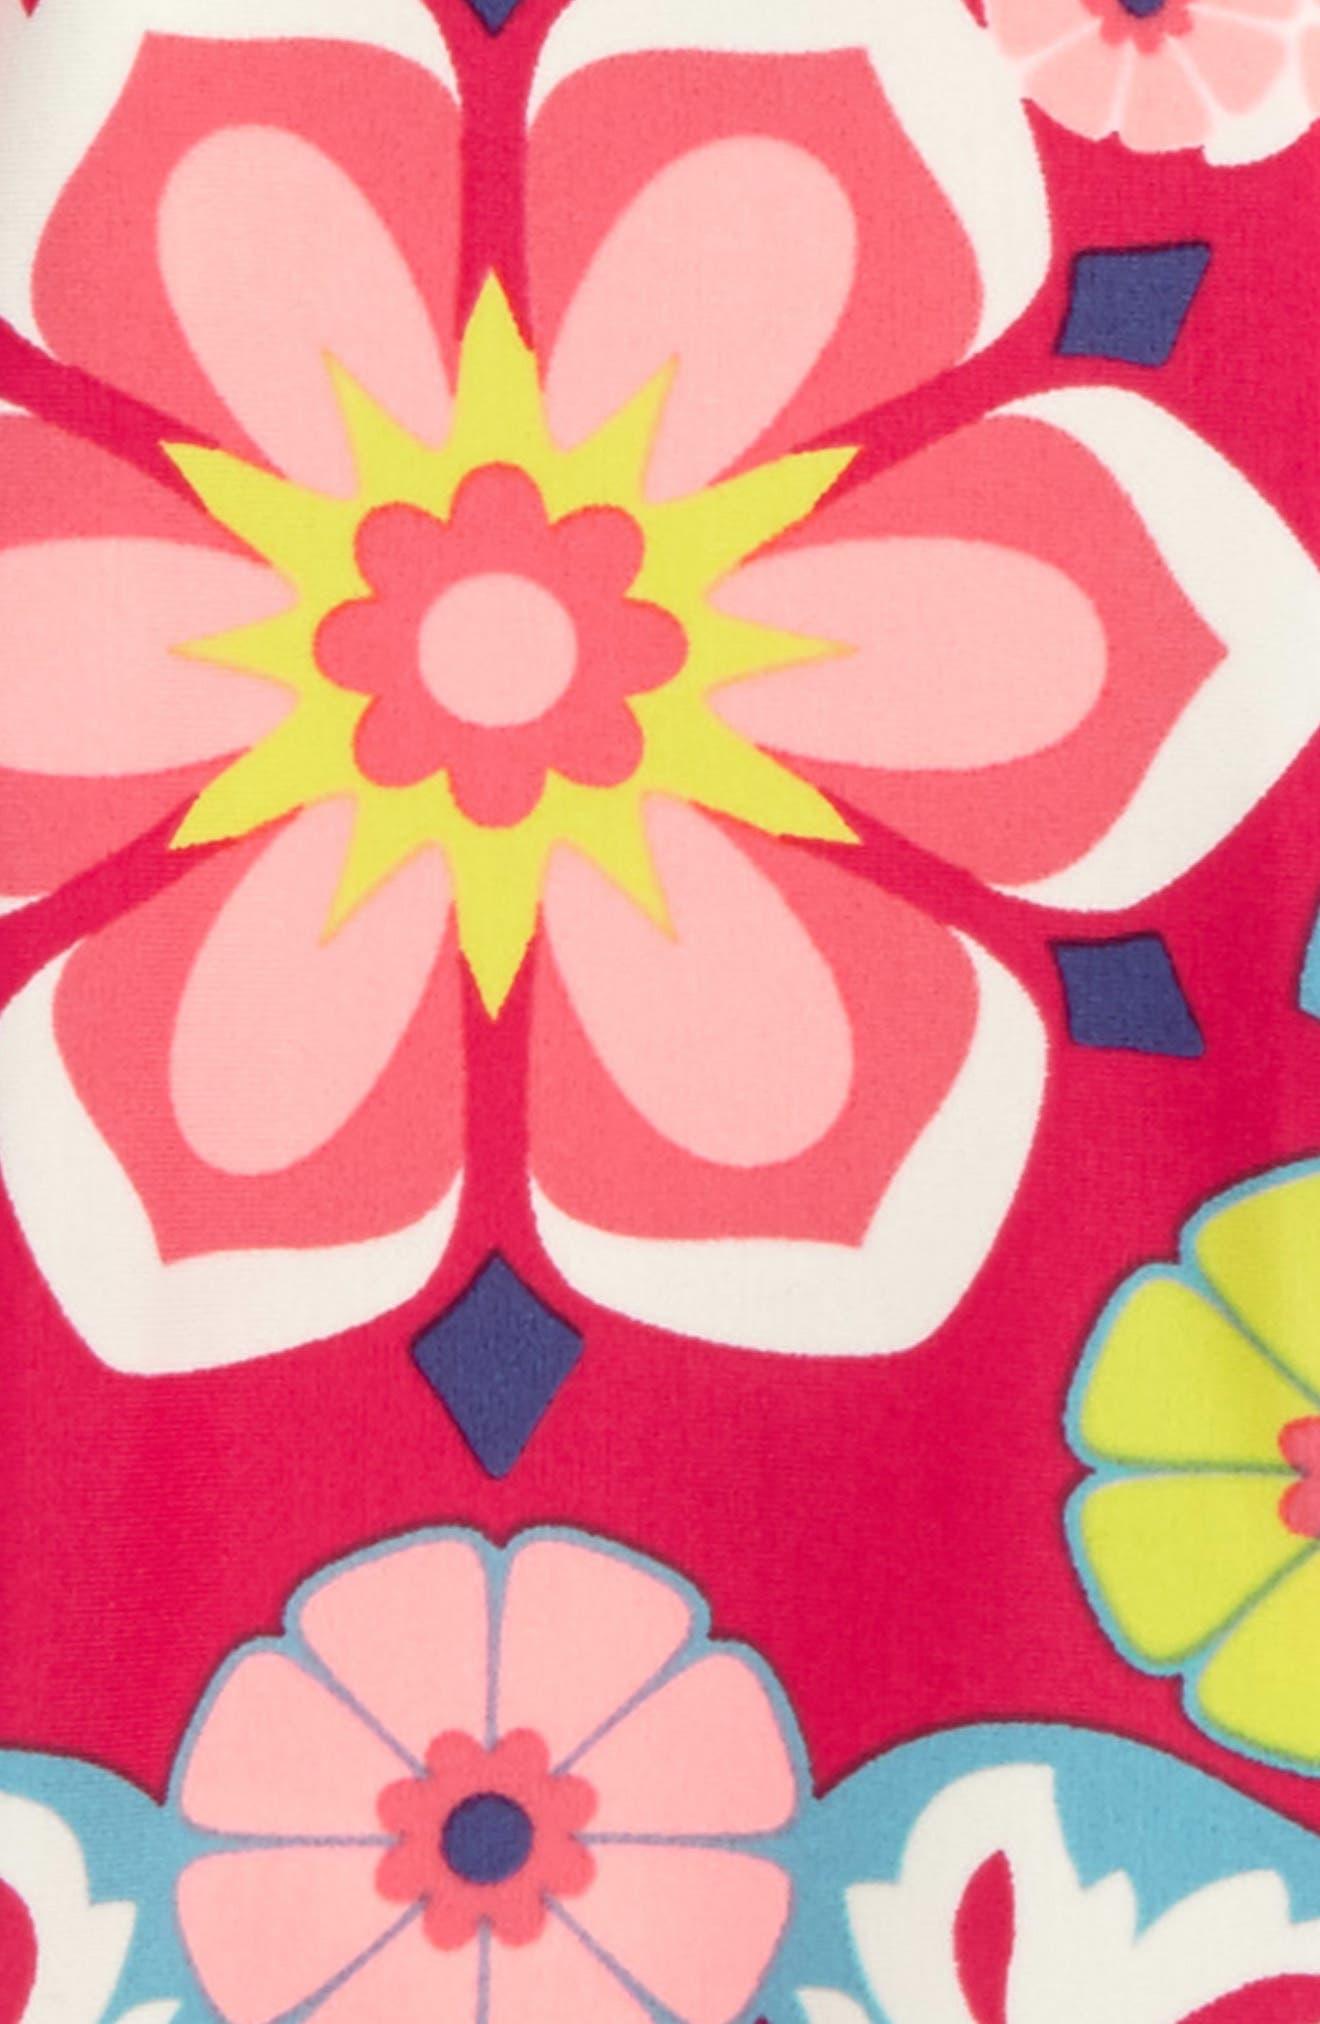 Flora One-Piece Rashguard Swimsuit,                             Alternate thumbnail 2, color,                             698